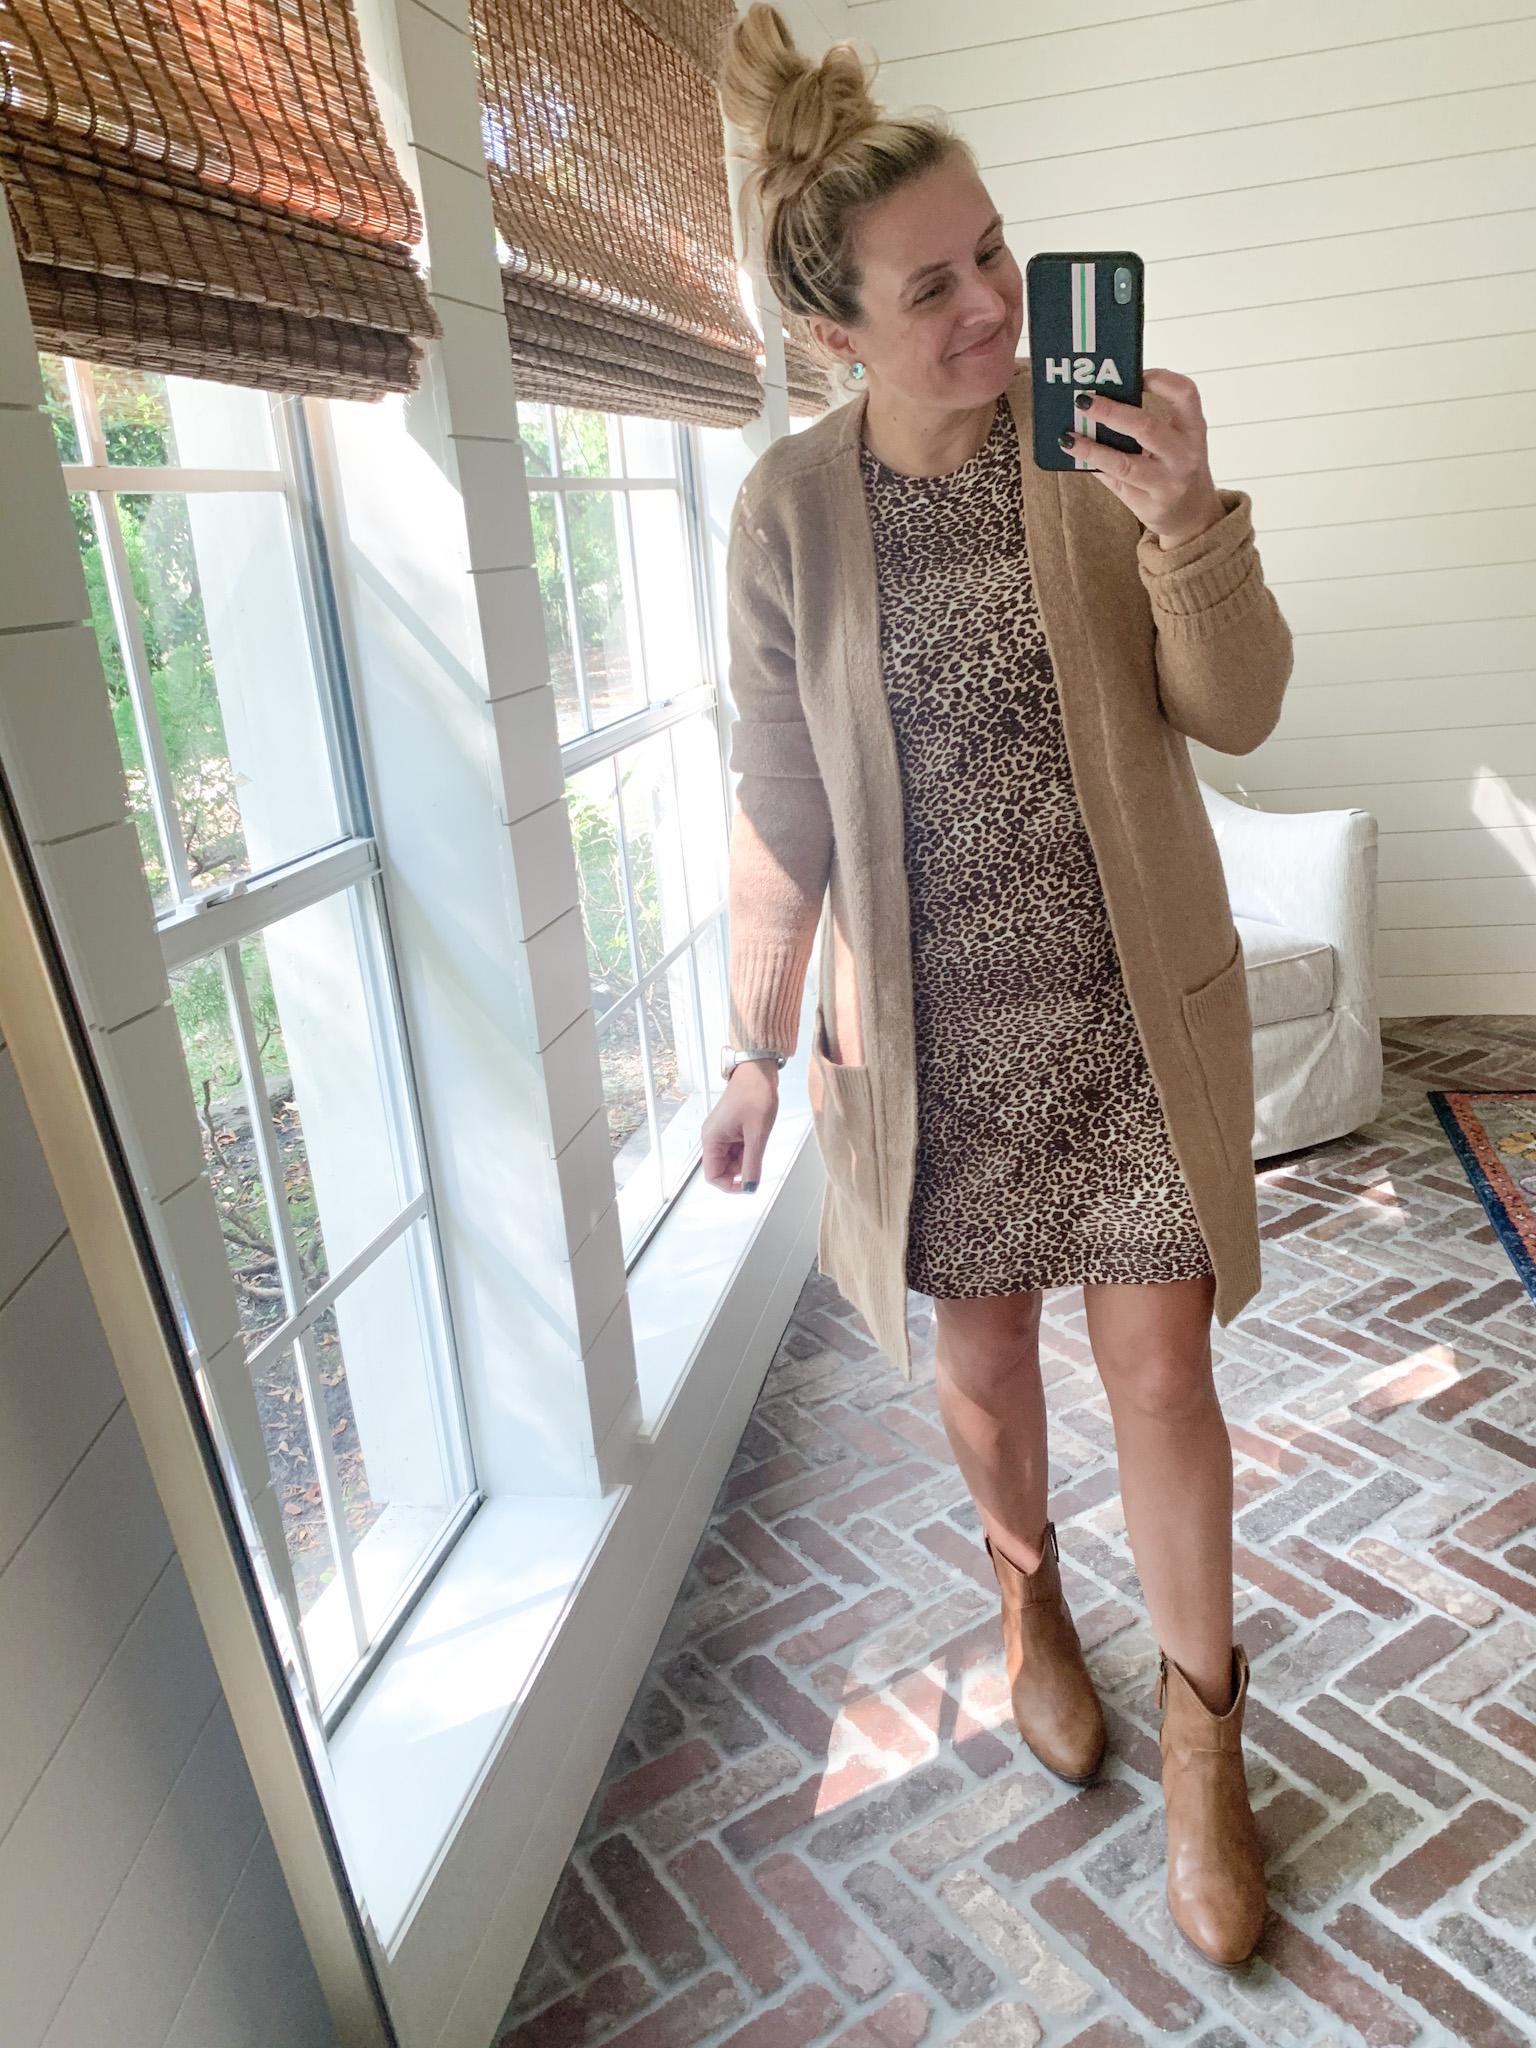 Amazon Haul by popular Houston fashion blog, Fancy Ashley: image of a woman wearing a Amazon Daily Ritual Leopard print puff sleeve dress, Walmart Scoop Women's Willow Western Booties, and Amazon Goodthreads Women's Boucle Cardigan Sweater.